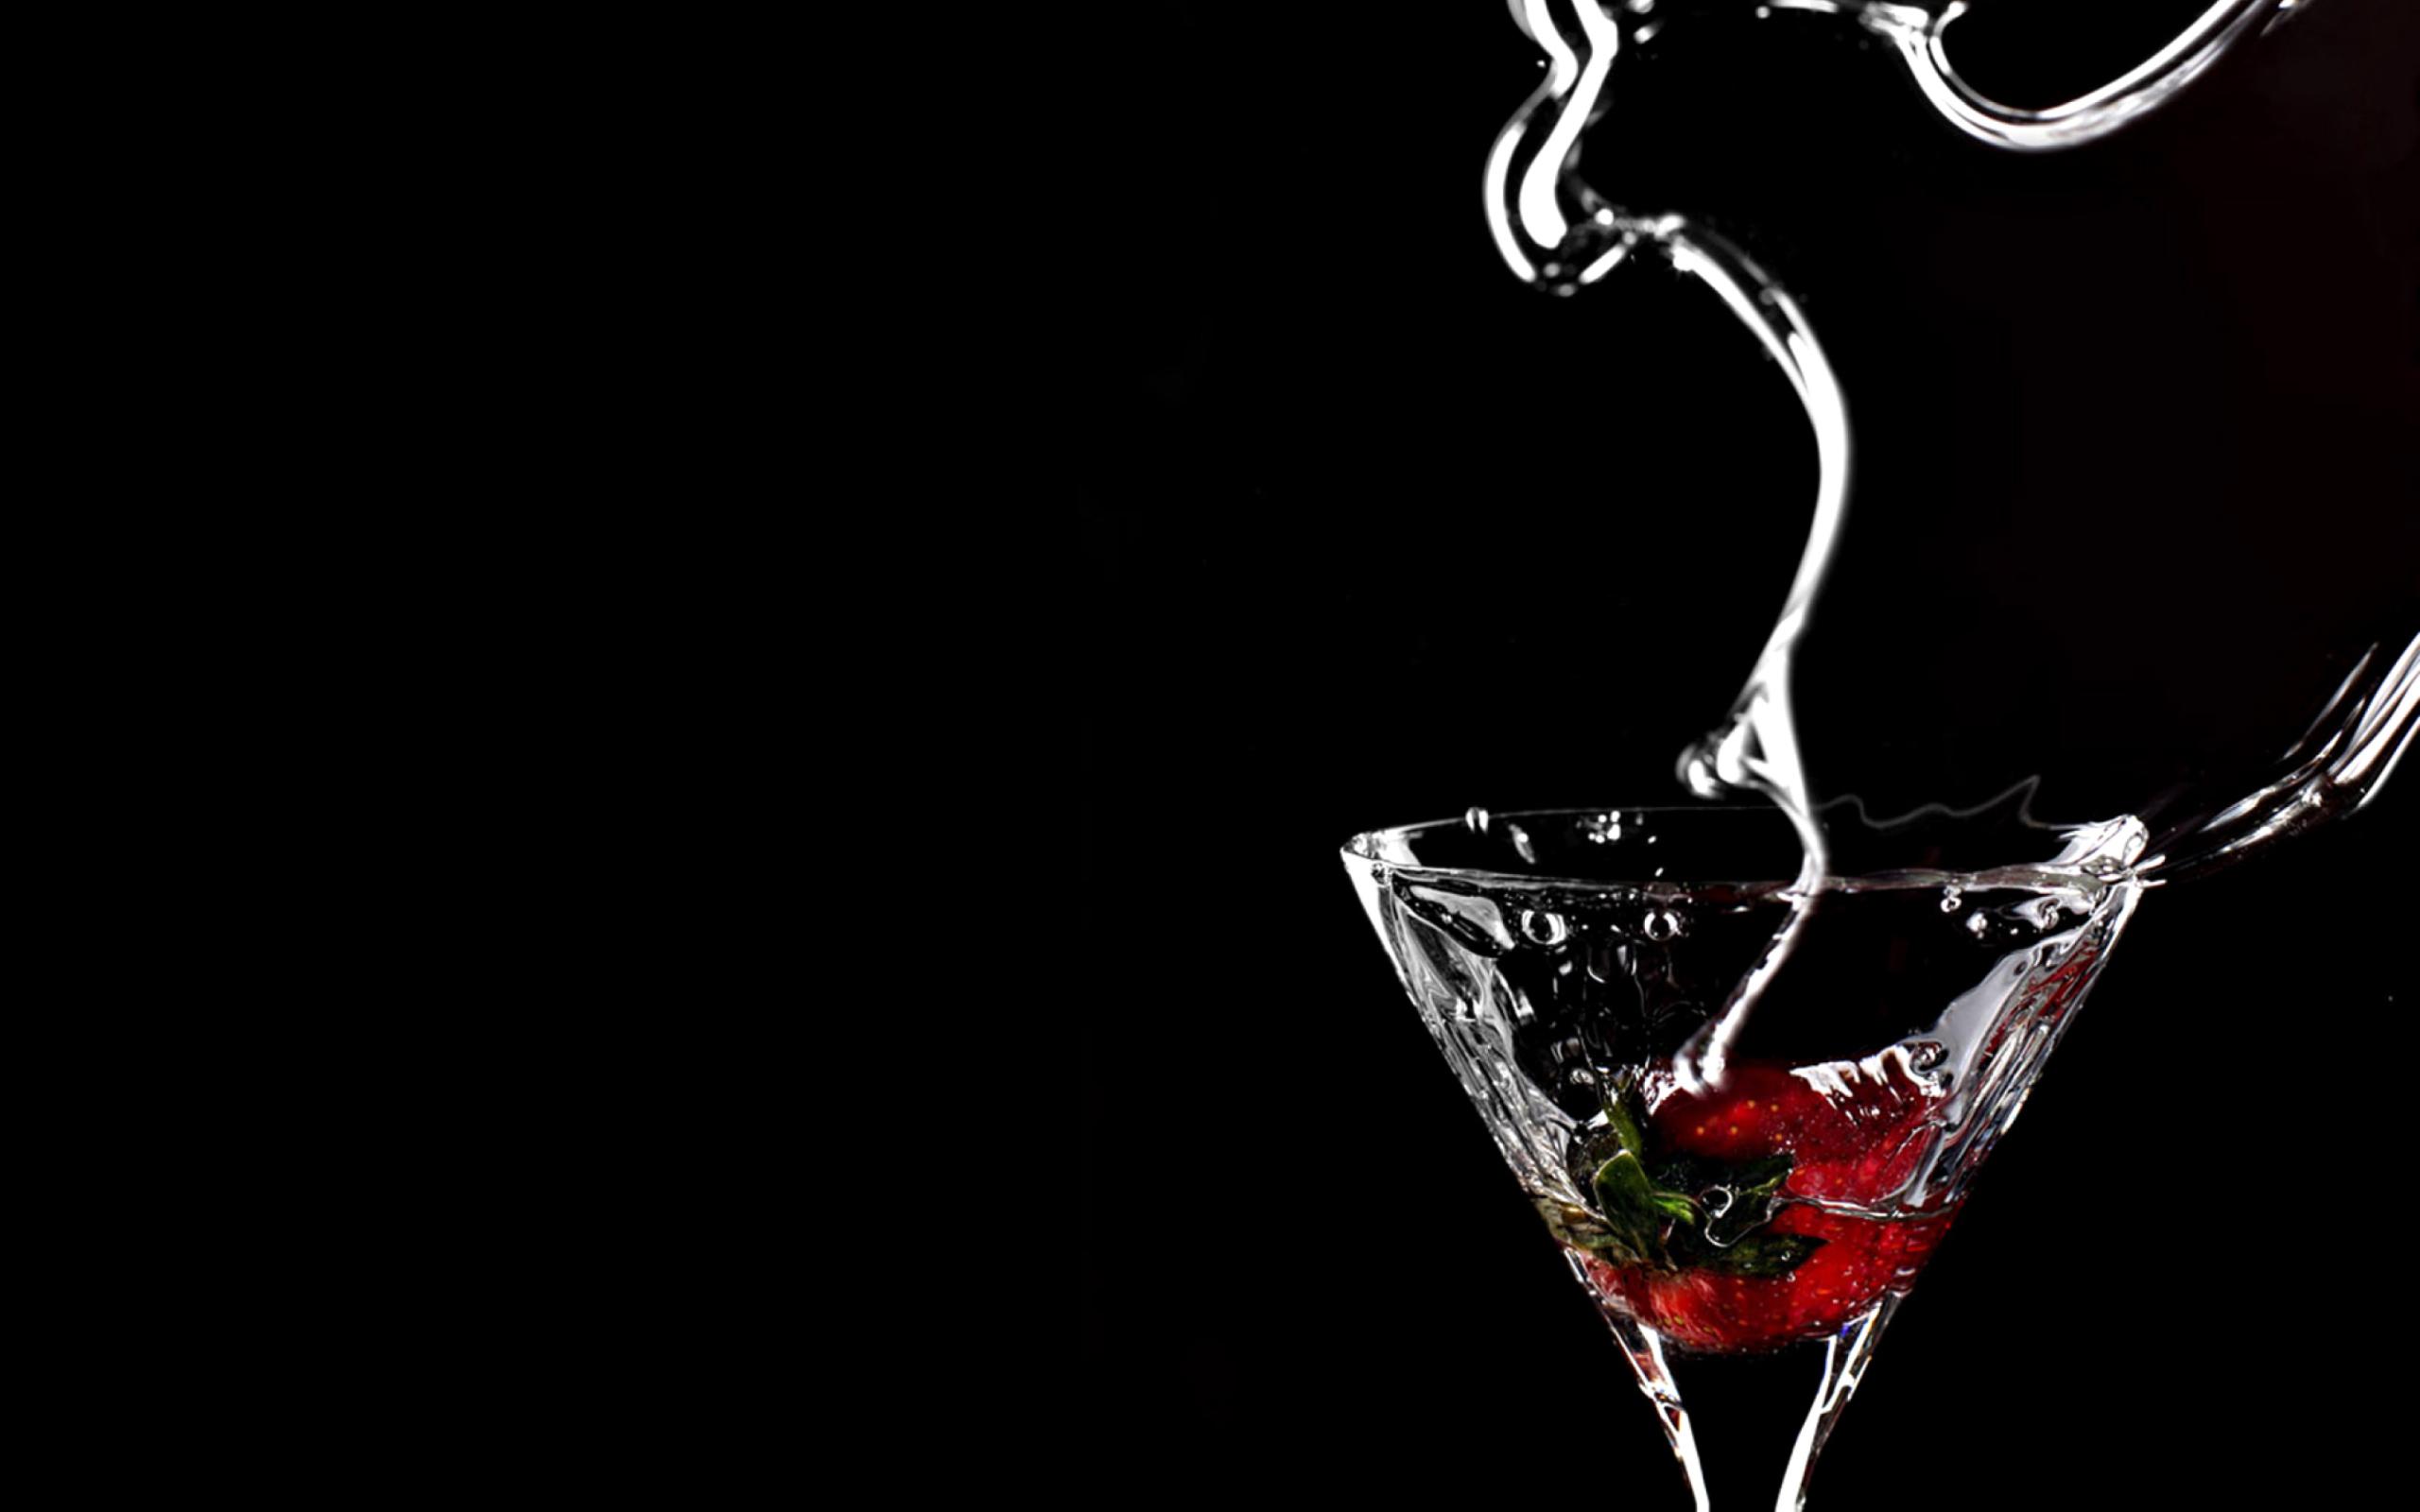 коктейль стаканы без смс